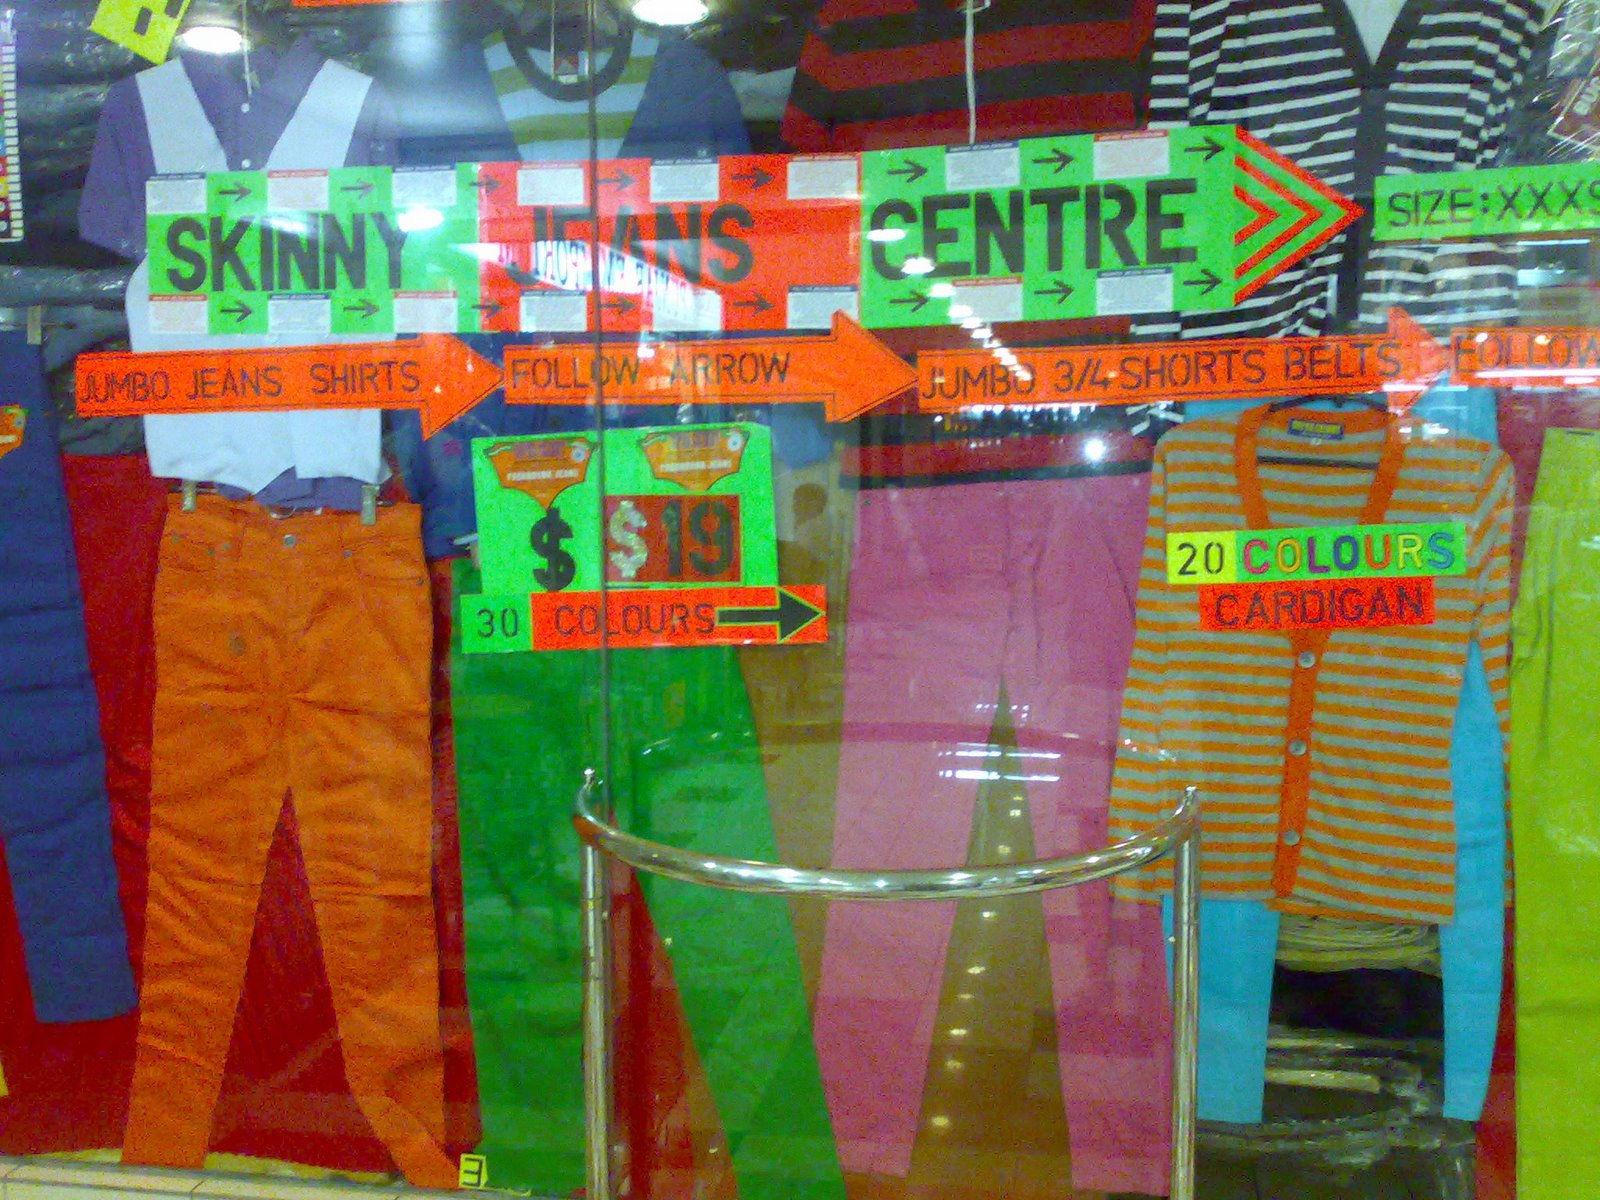 Peninsula Plaza skinny jeans